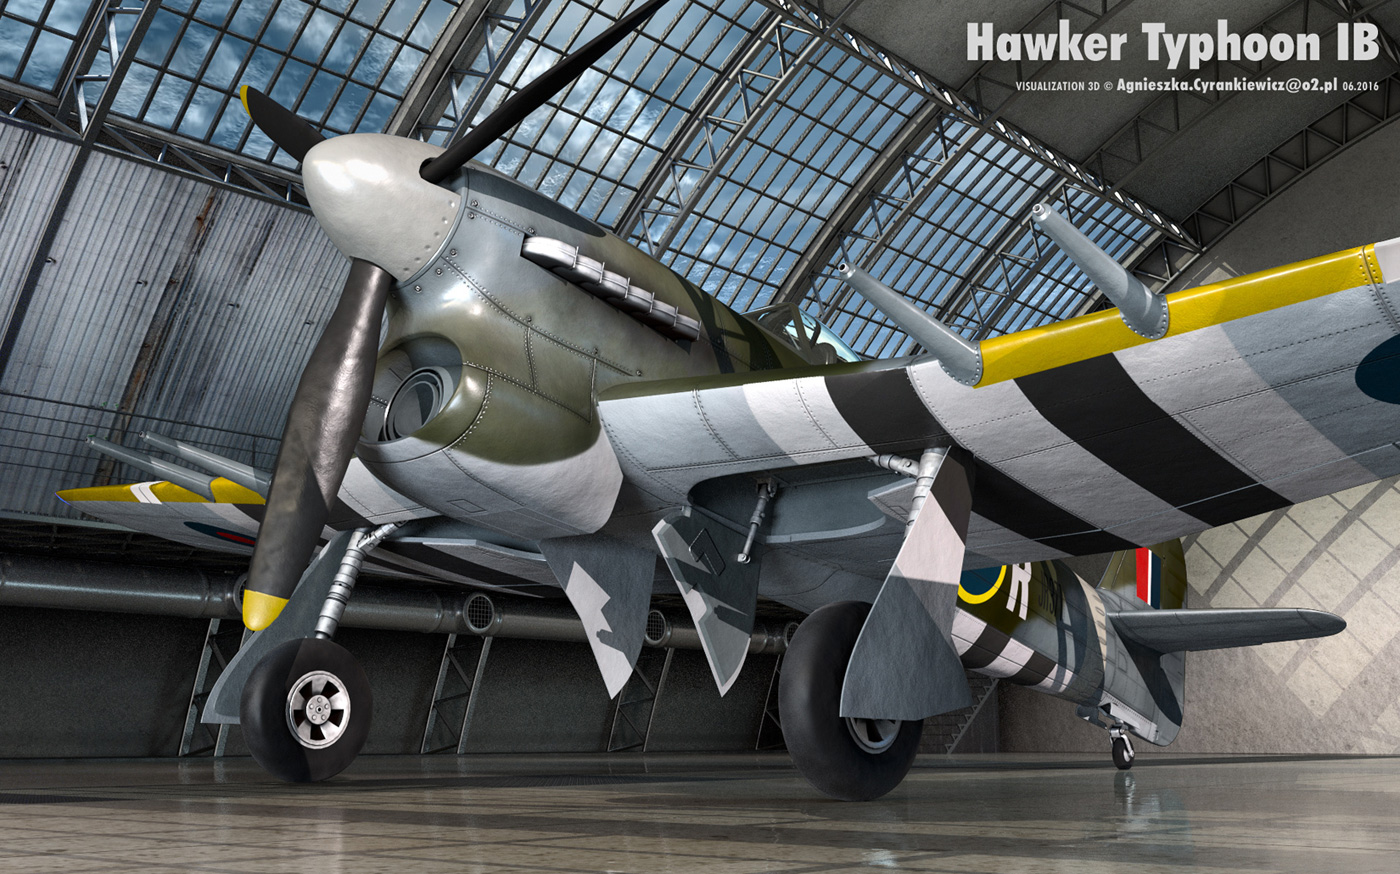 Hawker Typhoon IB, airplane, plane, WWII, war